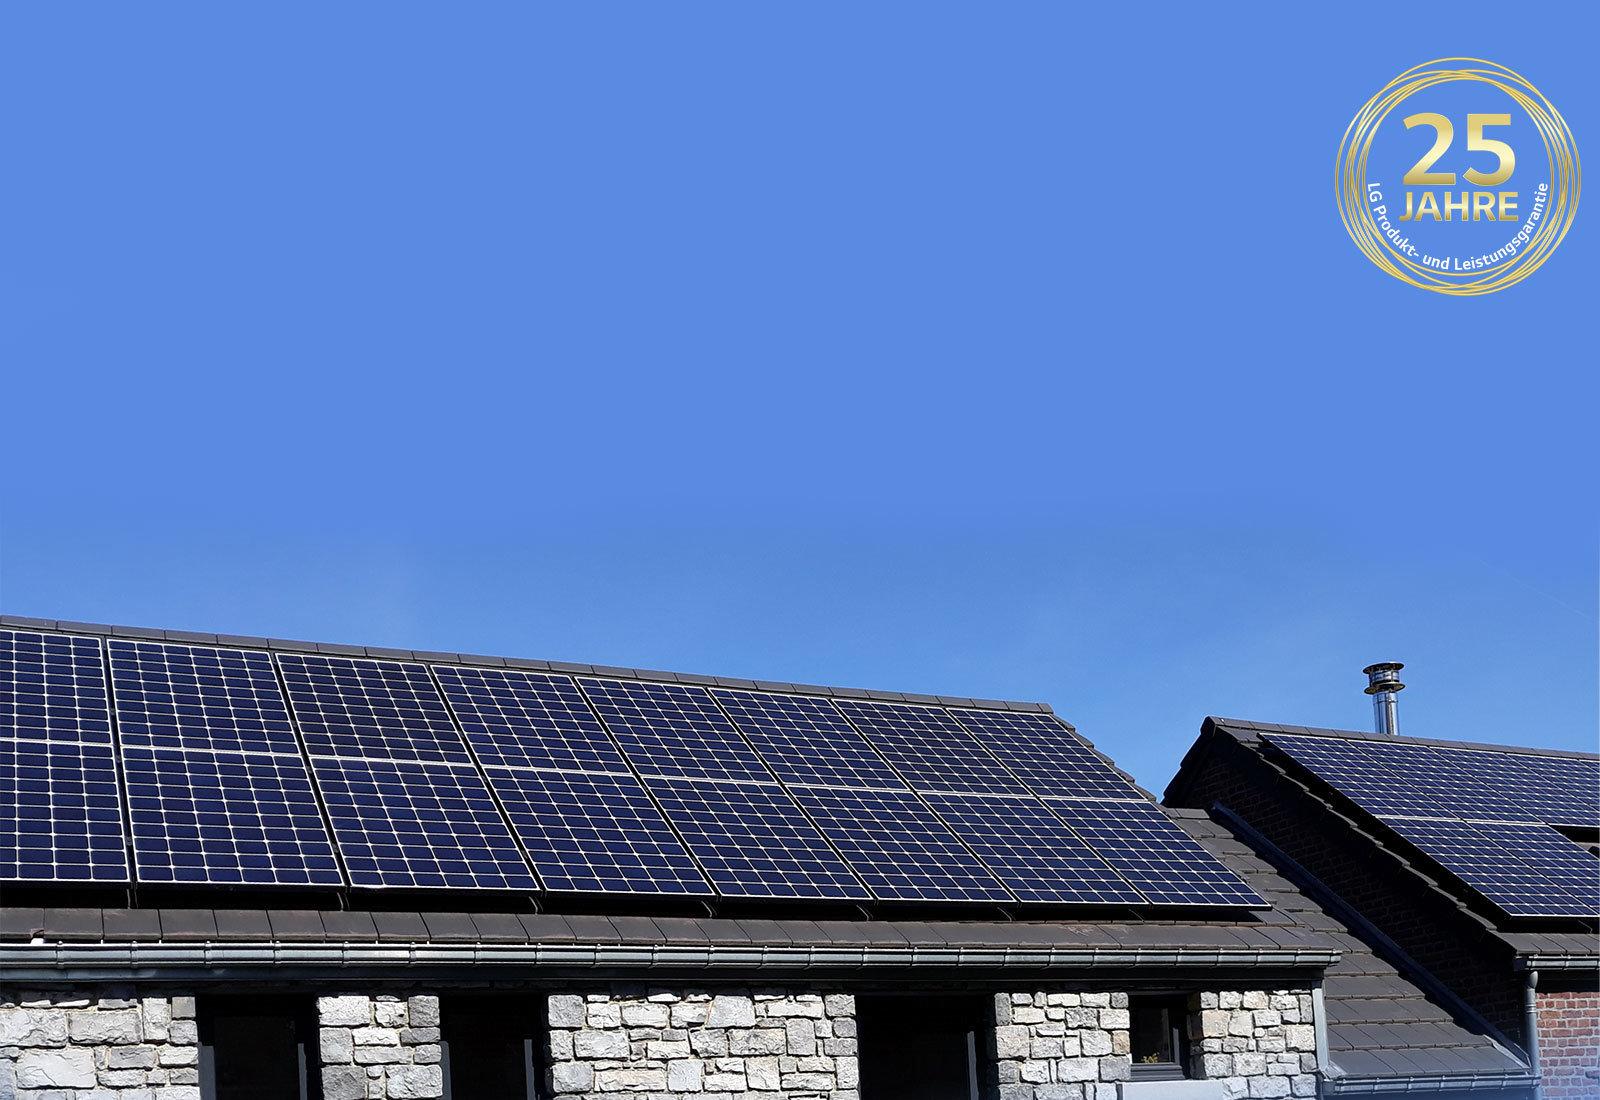 myCleantechSolarPower™ - LG Solarpannels (C) - Musterbild